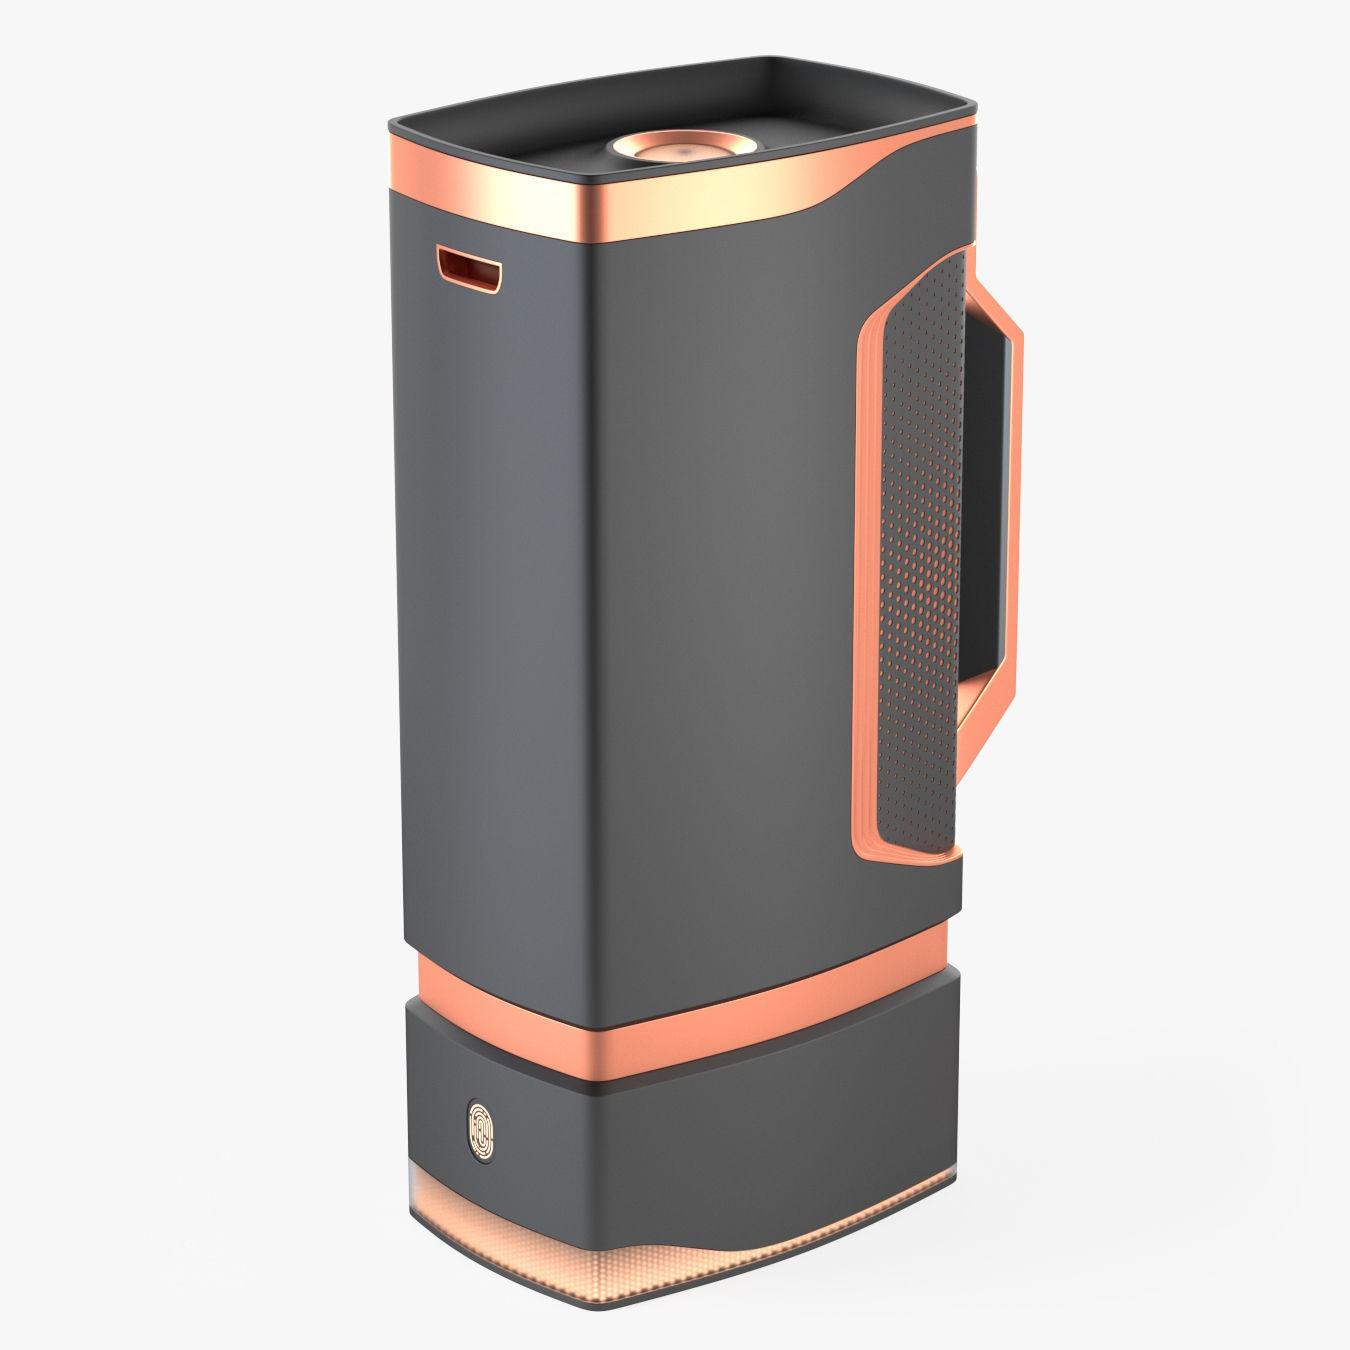 Concept Electric Kettle